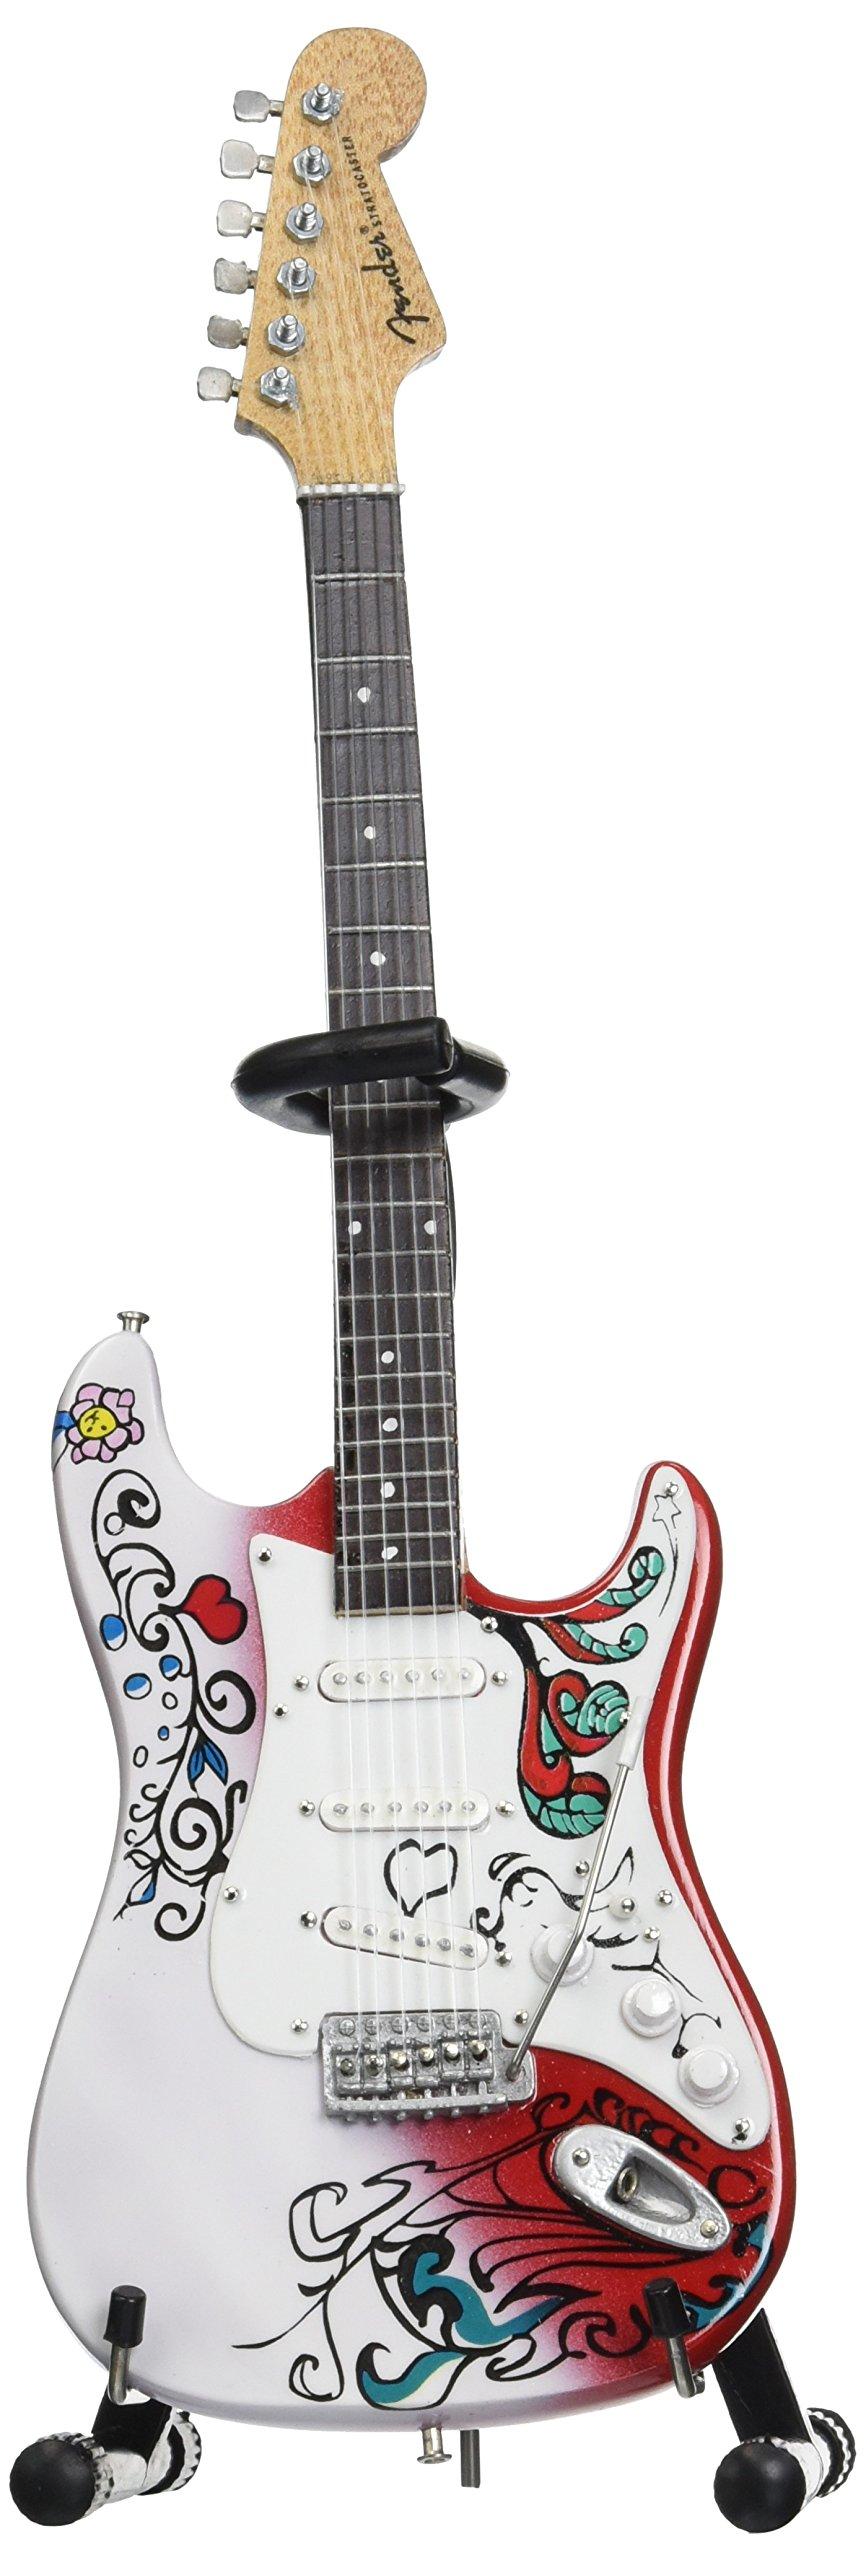 Axe Heaven JH-001 Jimi Hendrix Monterey Stratocaster Mini Replica Guitar by AXE HEAVEN